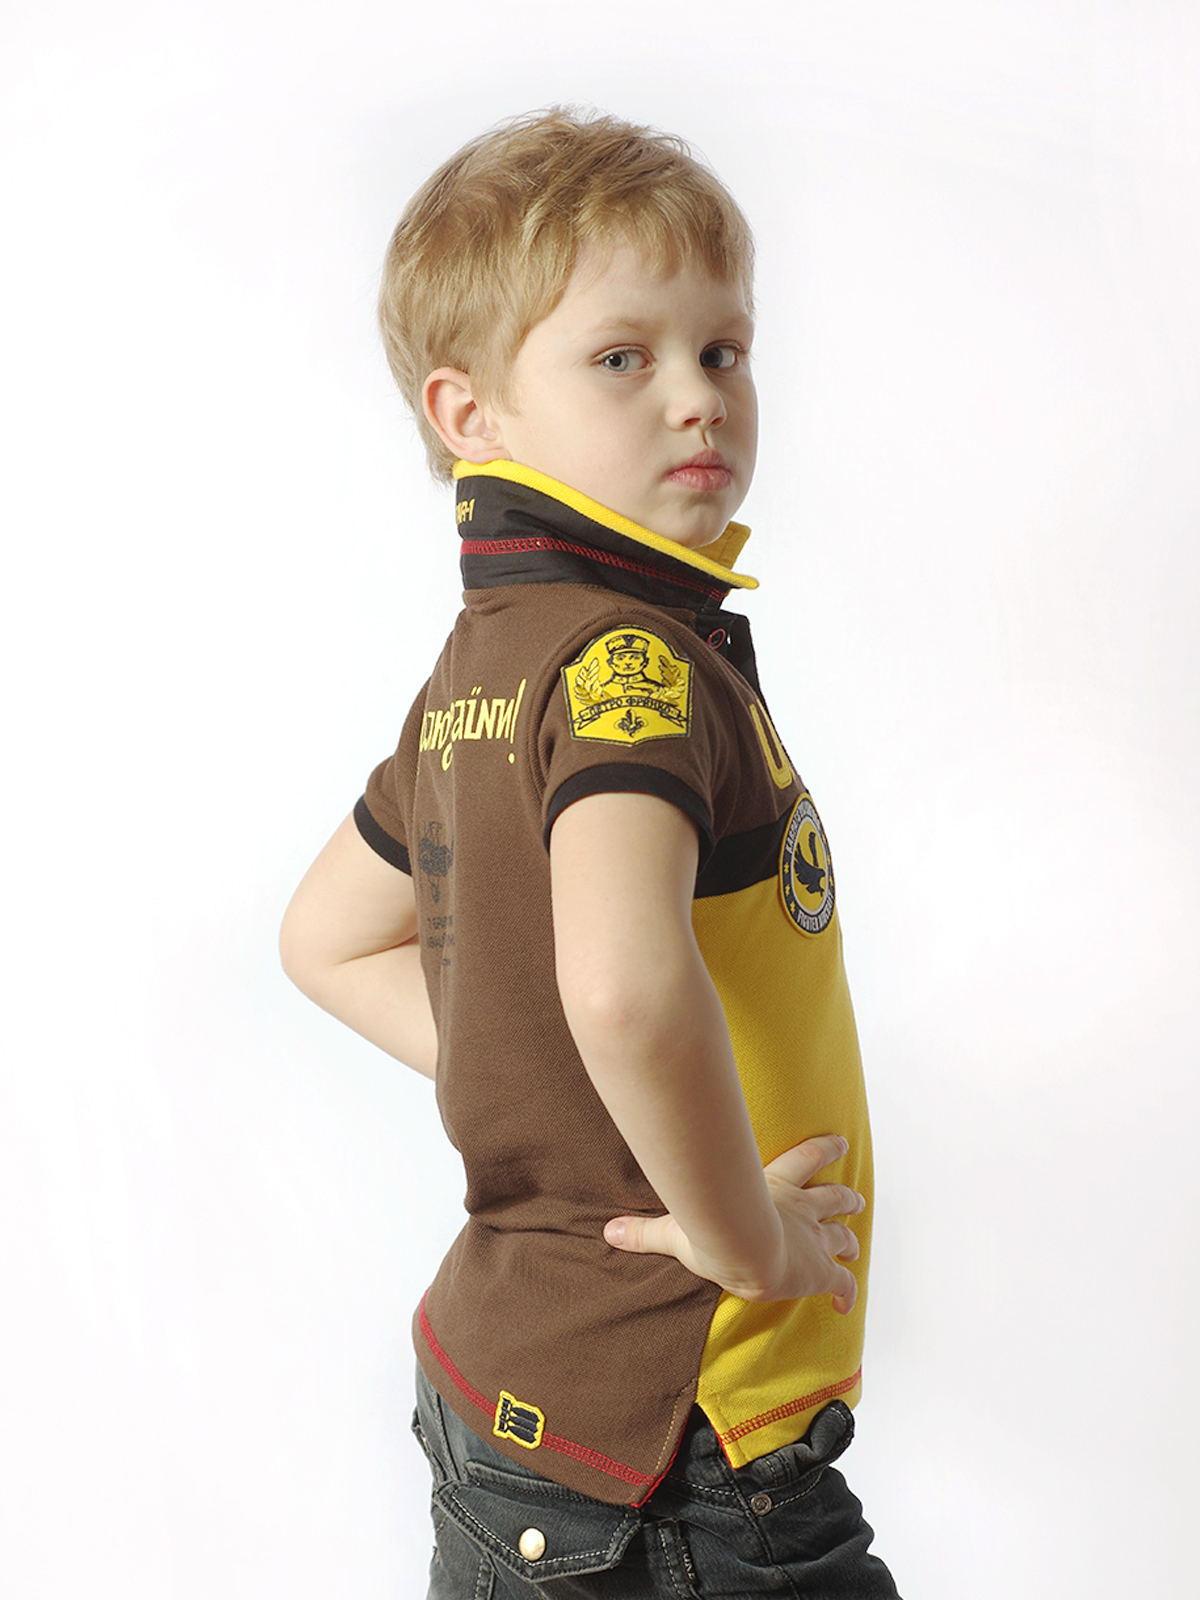 Kids Polo Shirt 7 Brigade (Petro Franko). Color yellow.  Technique of prints applied: embroidery, silkscreen printing.